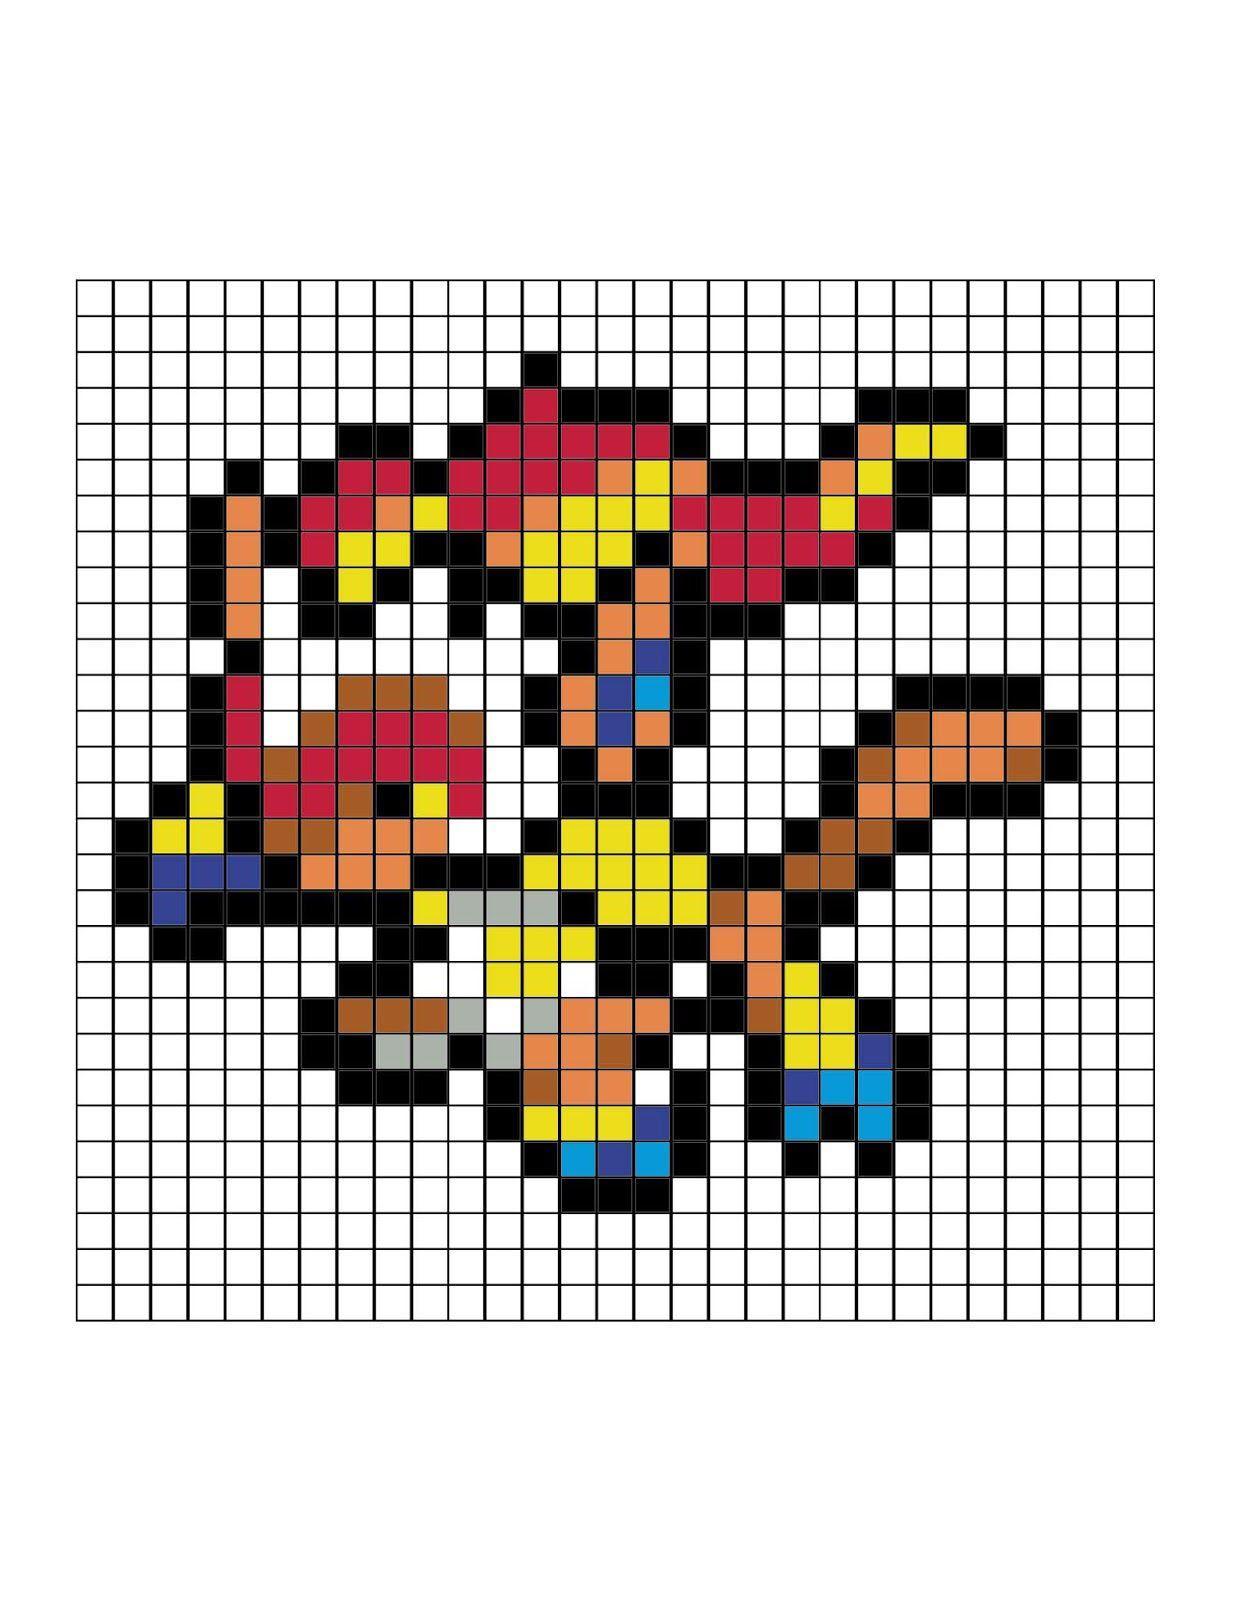 Pokemon Perler Bead Infernape Pattern Pixel Art Pokemon Perler Beads Pokemon Perler Beads Hd wallpapers and background images. pokemon perler bead infernape pattern